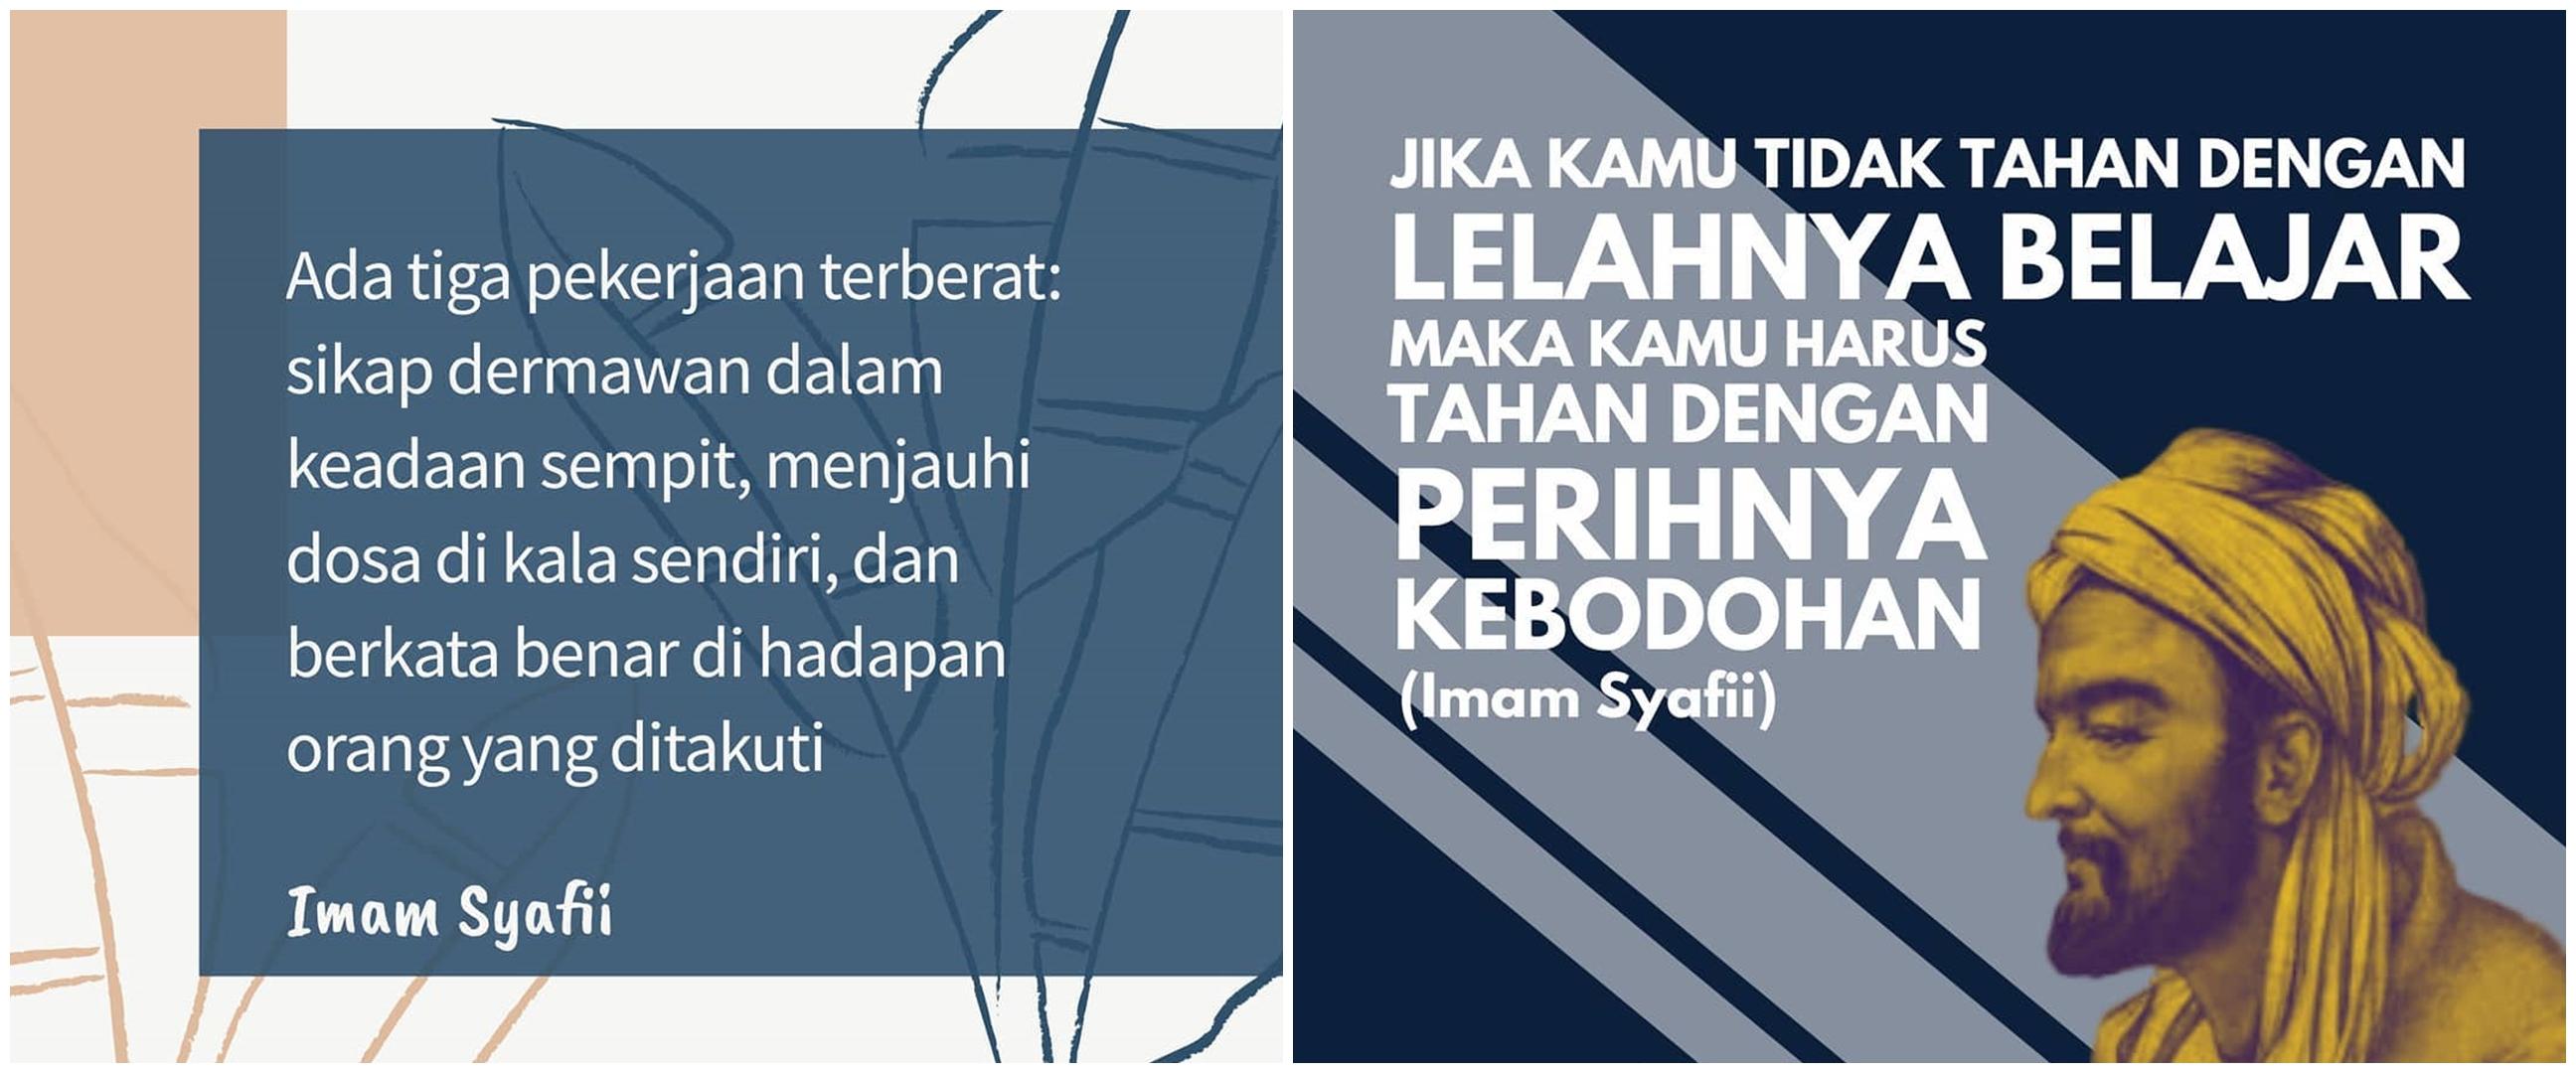 40 Kata-kata bijak ulama Imam Syafi'i, penuh makna